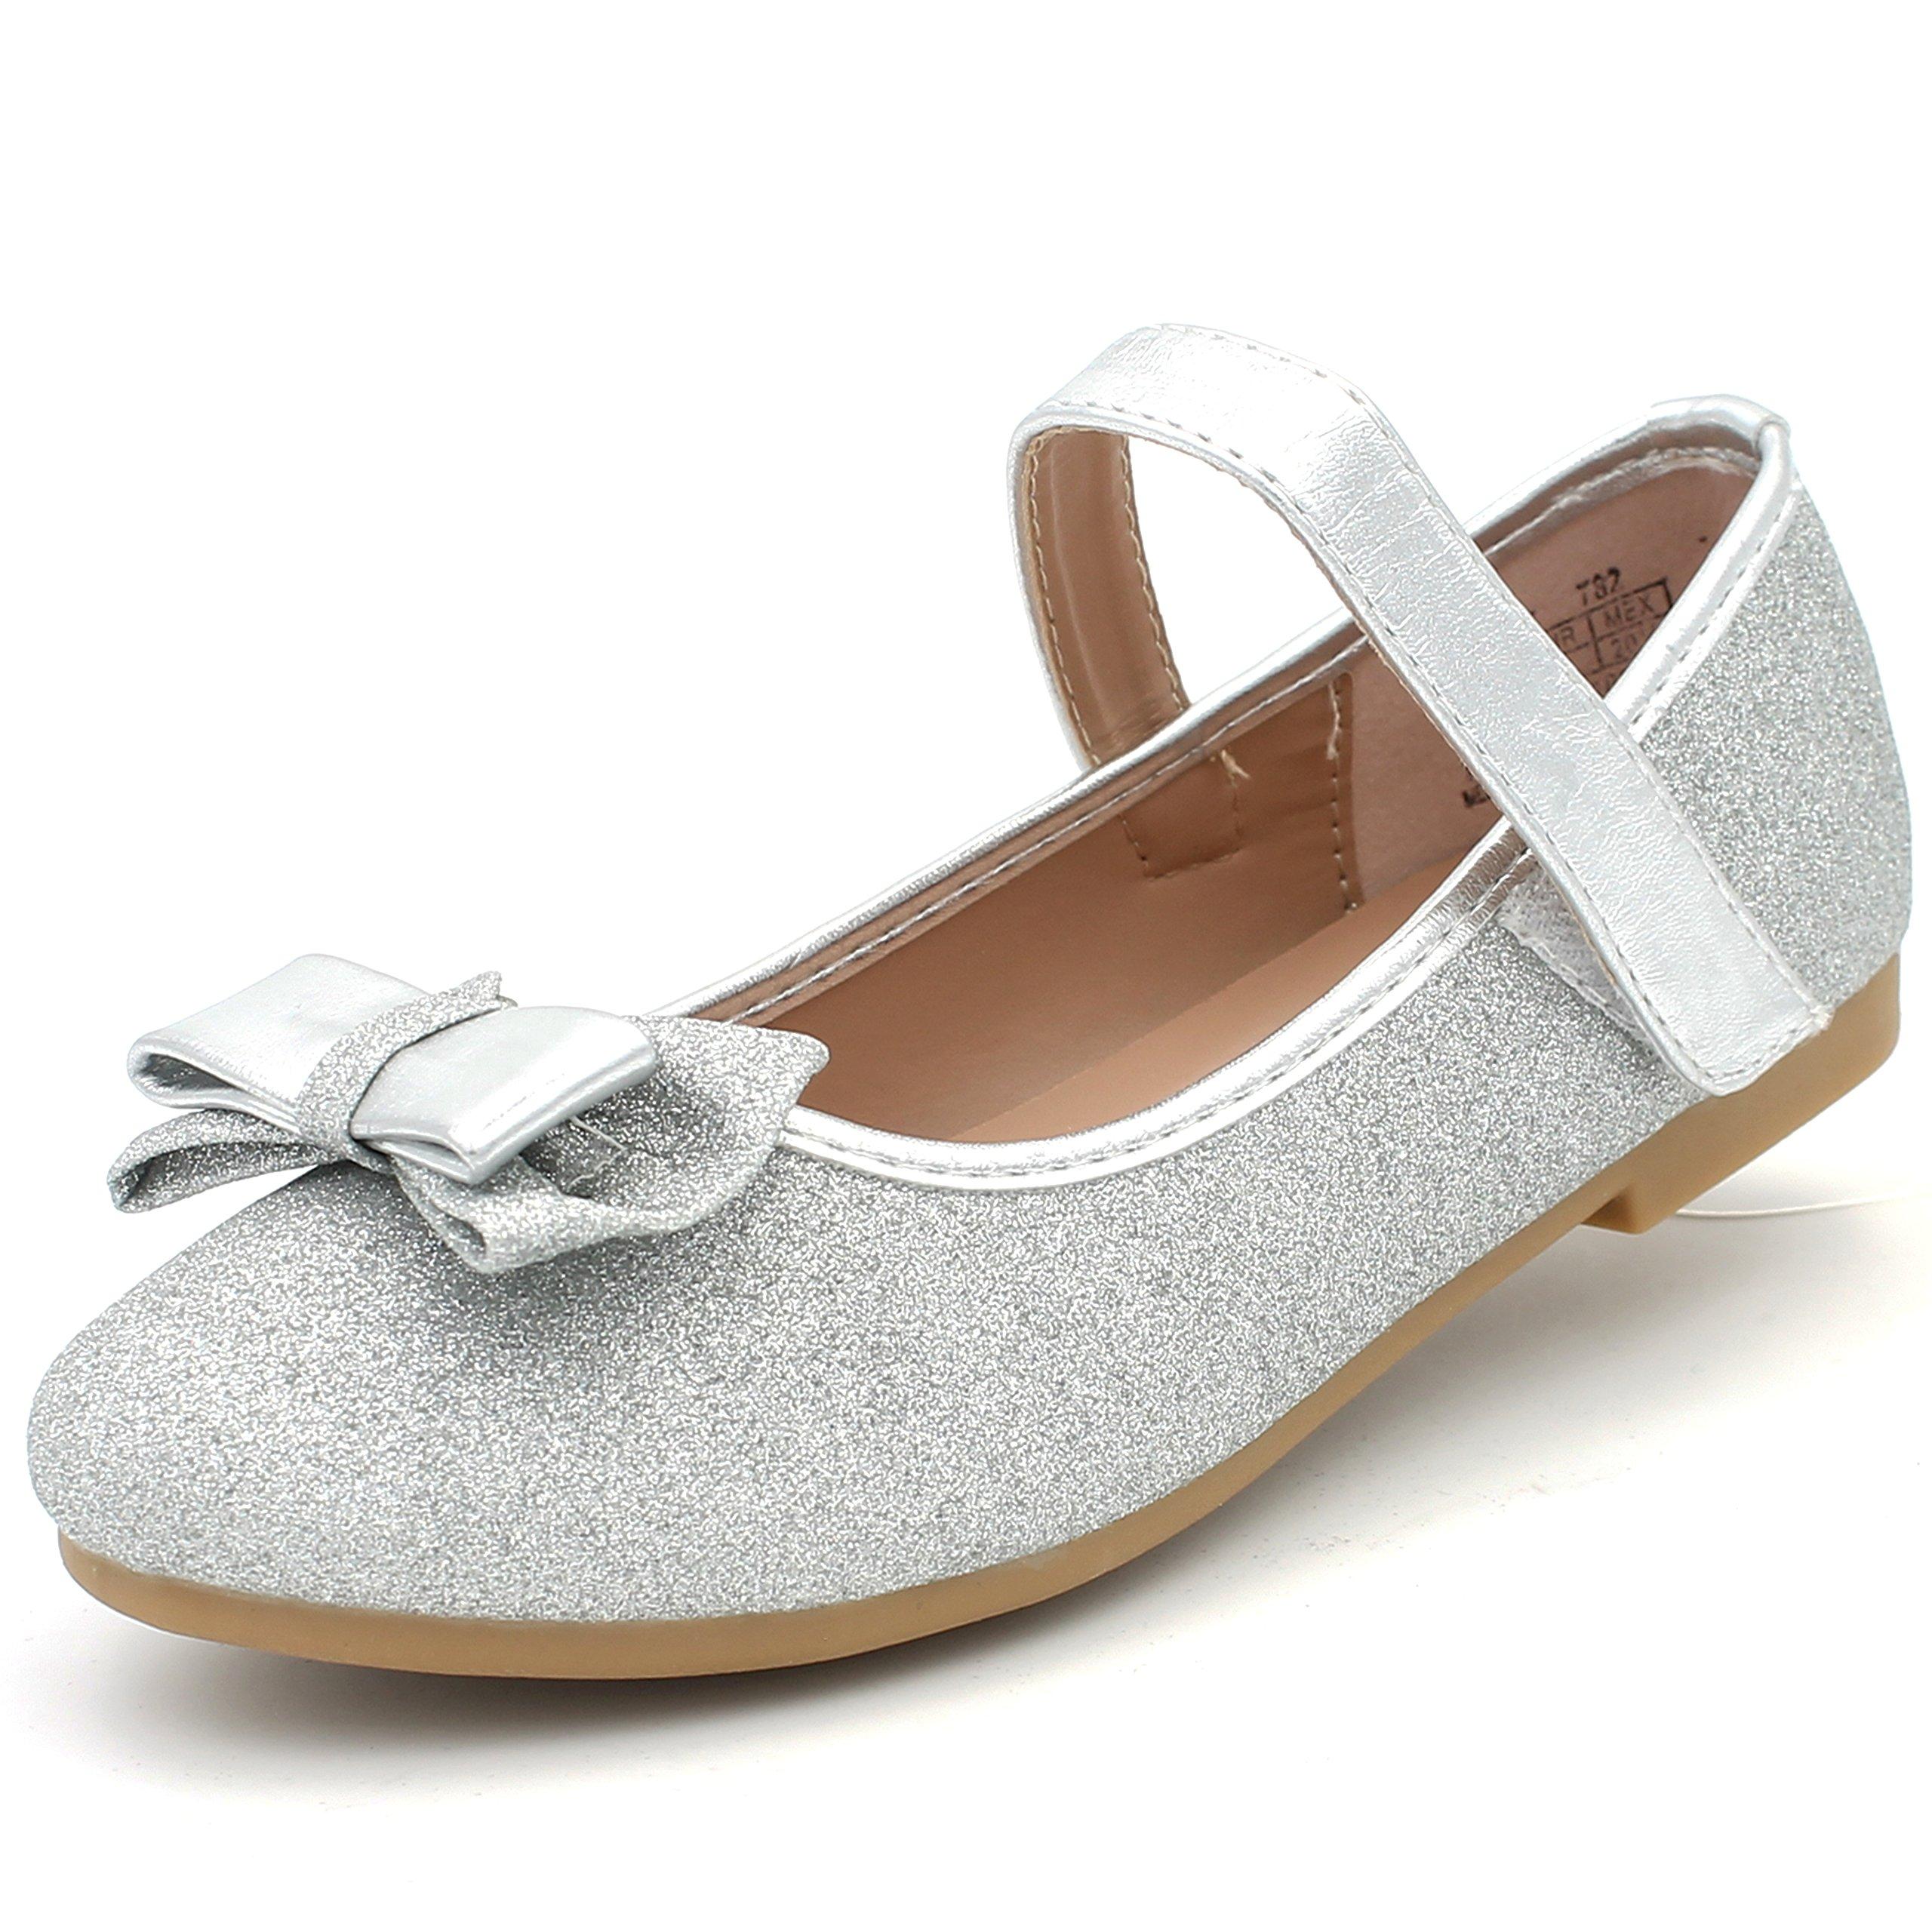 CAKI-DREAM SEEK Girl's Classic Glitter Dress Shoes Ballerina Flats Bow Cushion Mary Jane Strap (13 M US Little Kids, Silver)